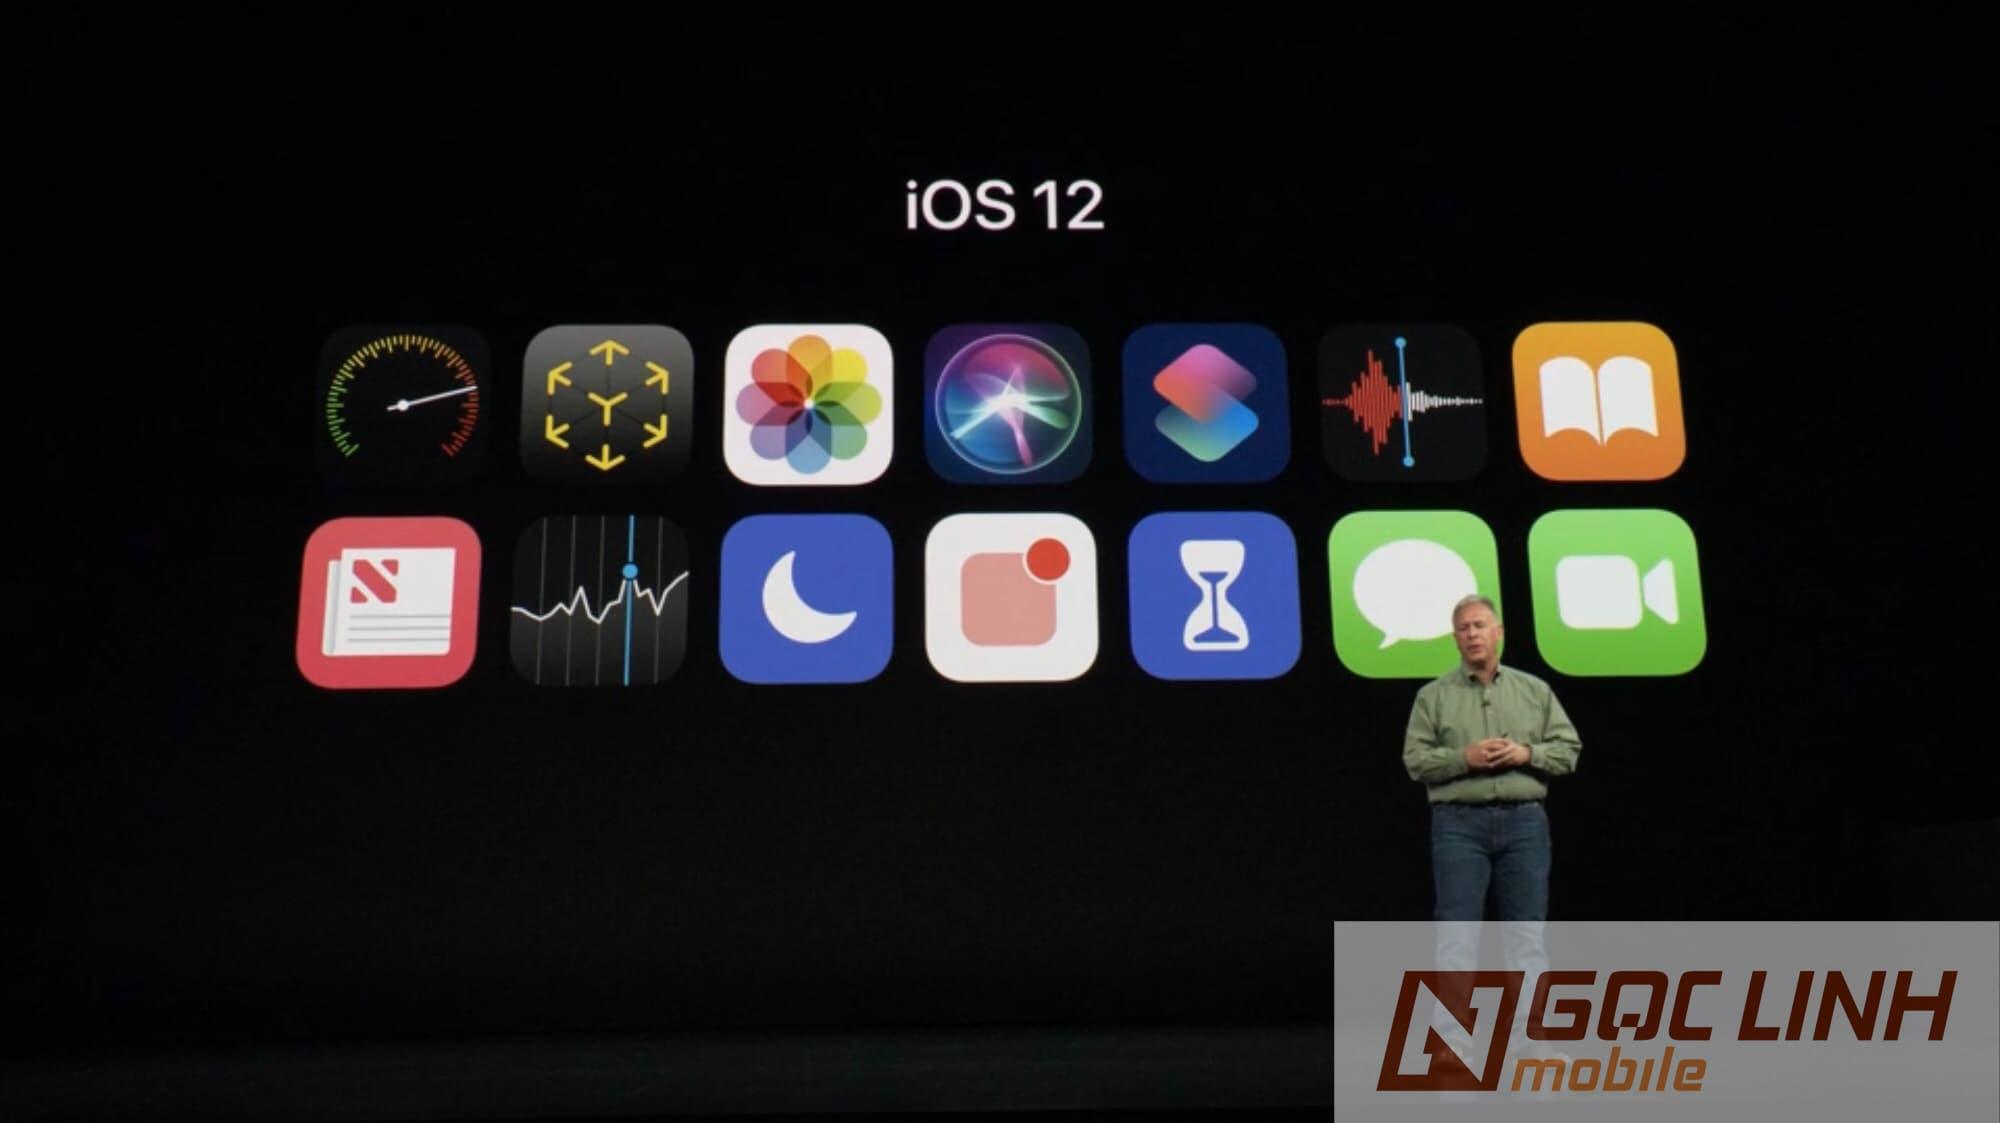 iphone Xs max iphone xs max - Ra mắt siêu phẩm iphone Xs, iphone Xs max, iphone Xr